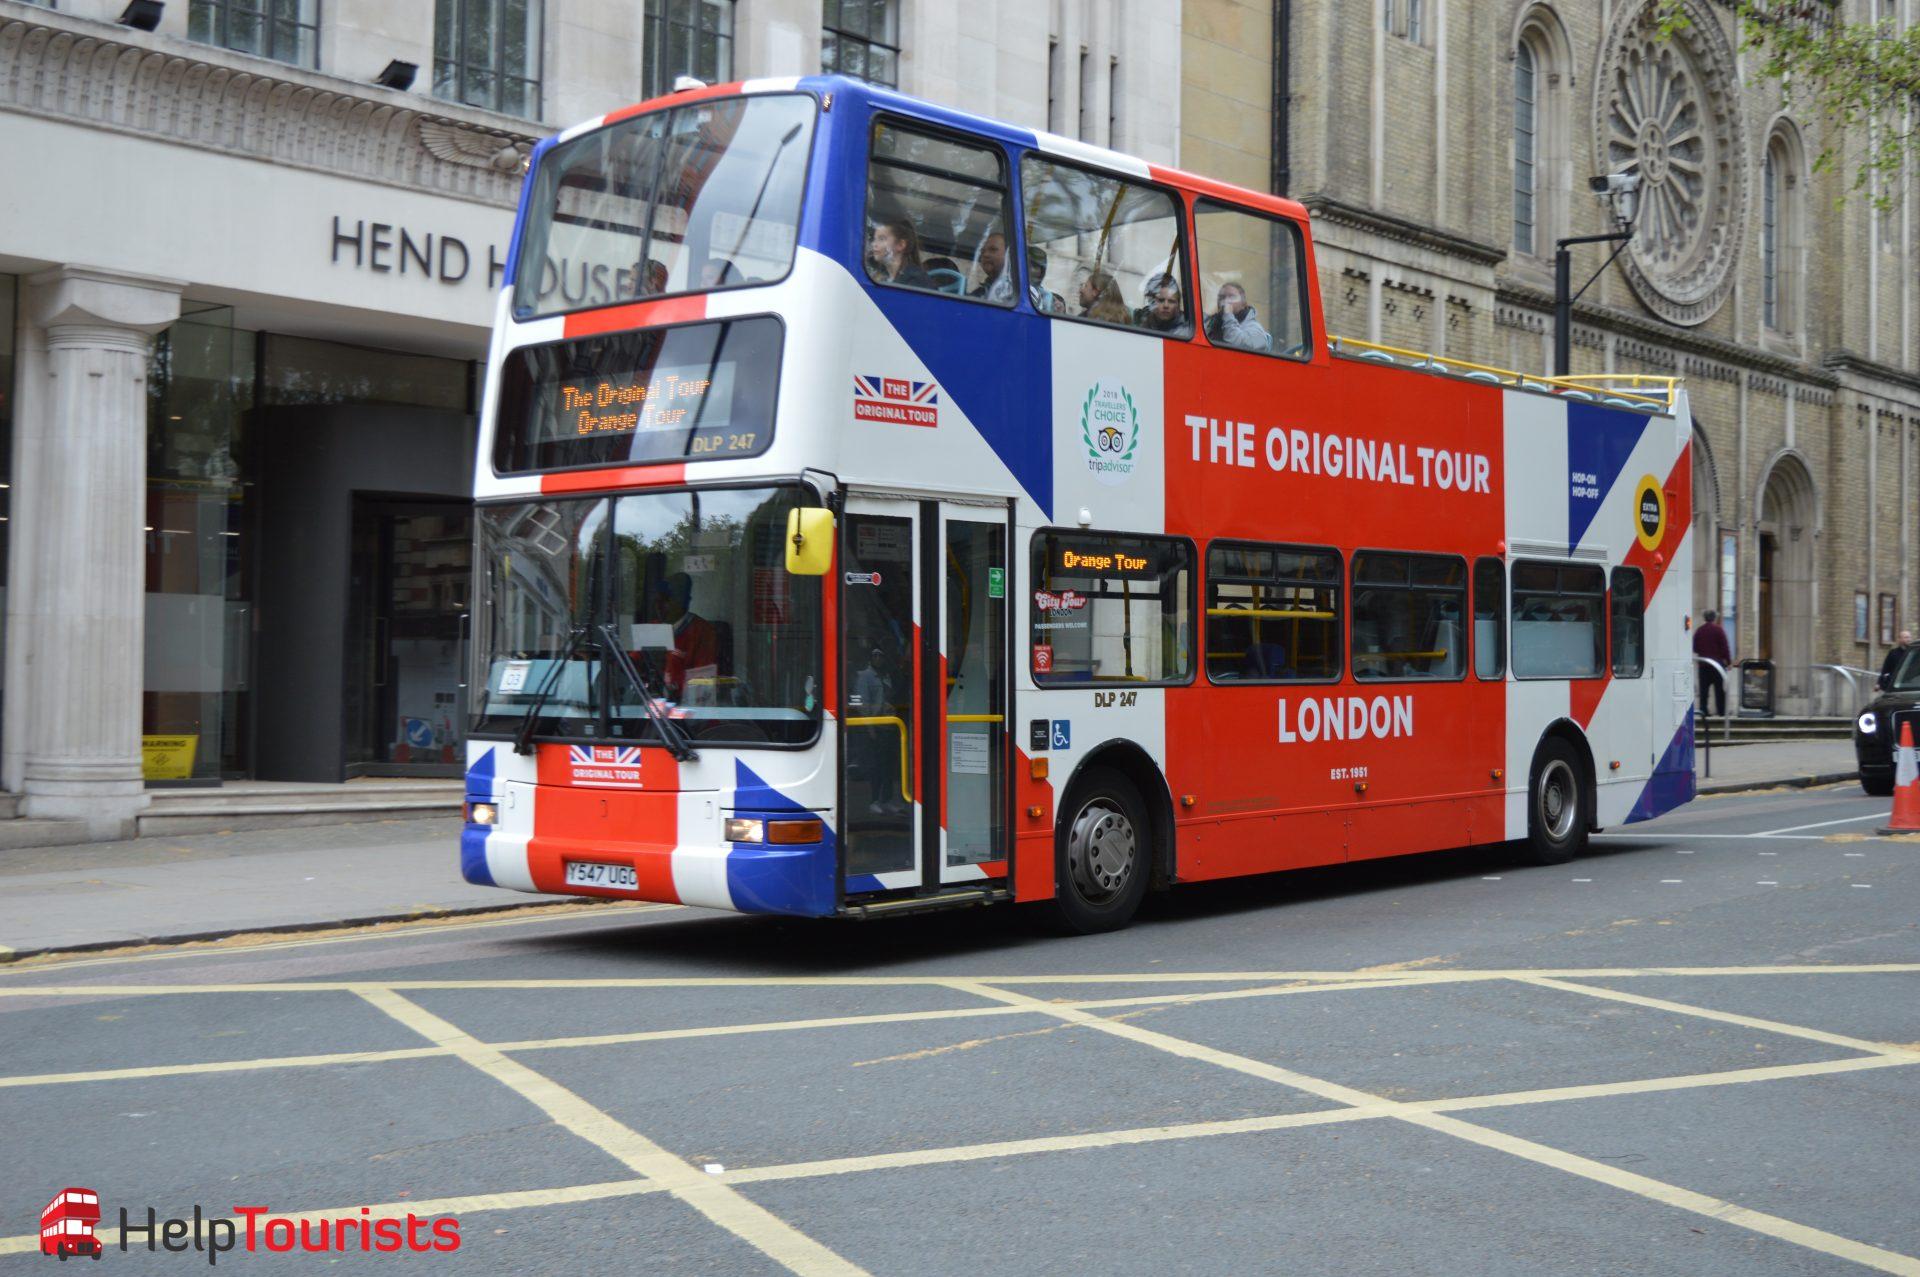 Sightseeing The Original Tour Bus London